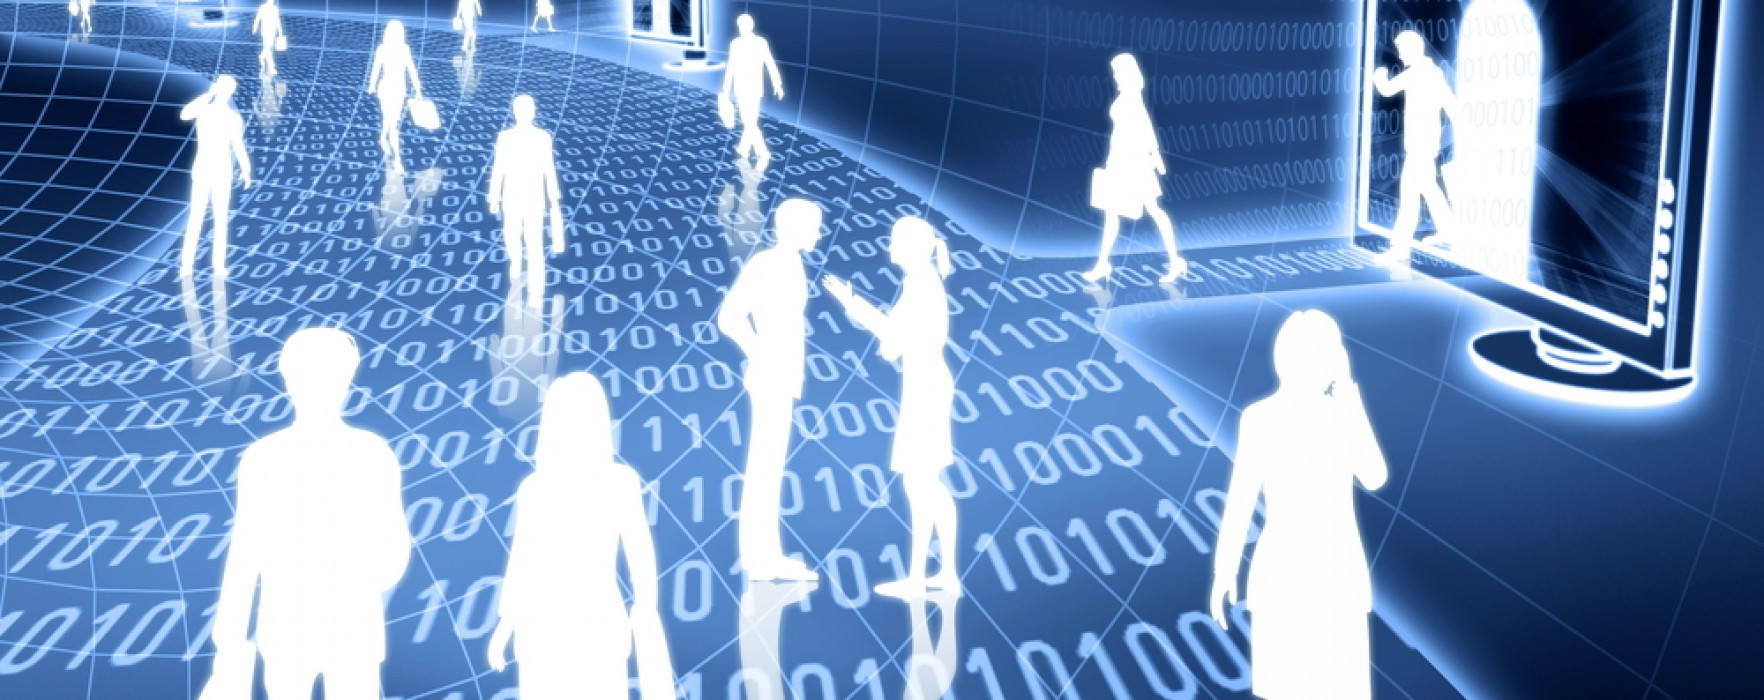 probleme big data